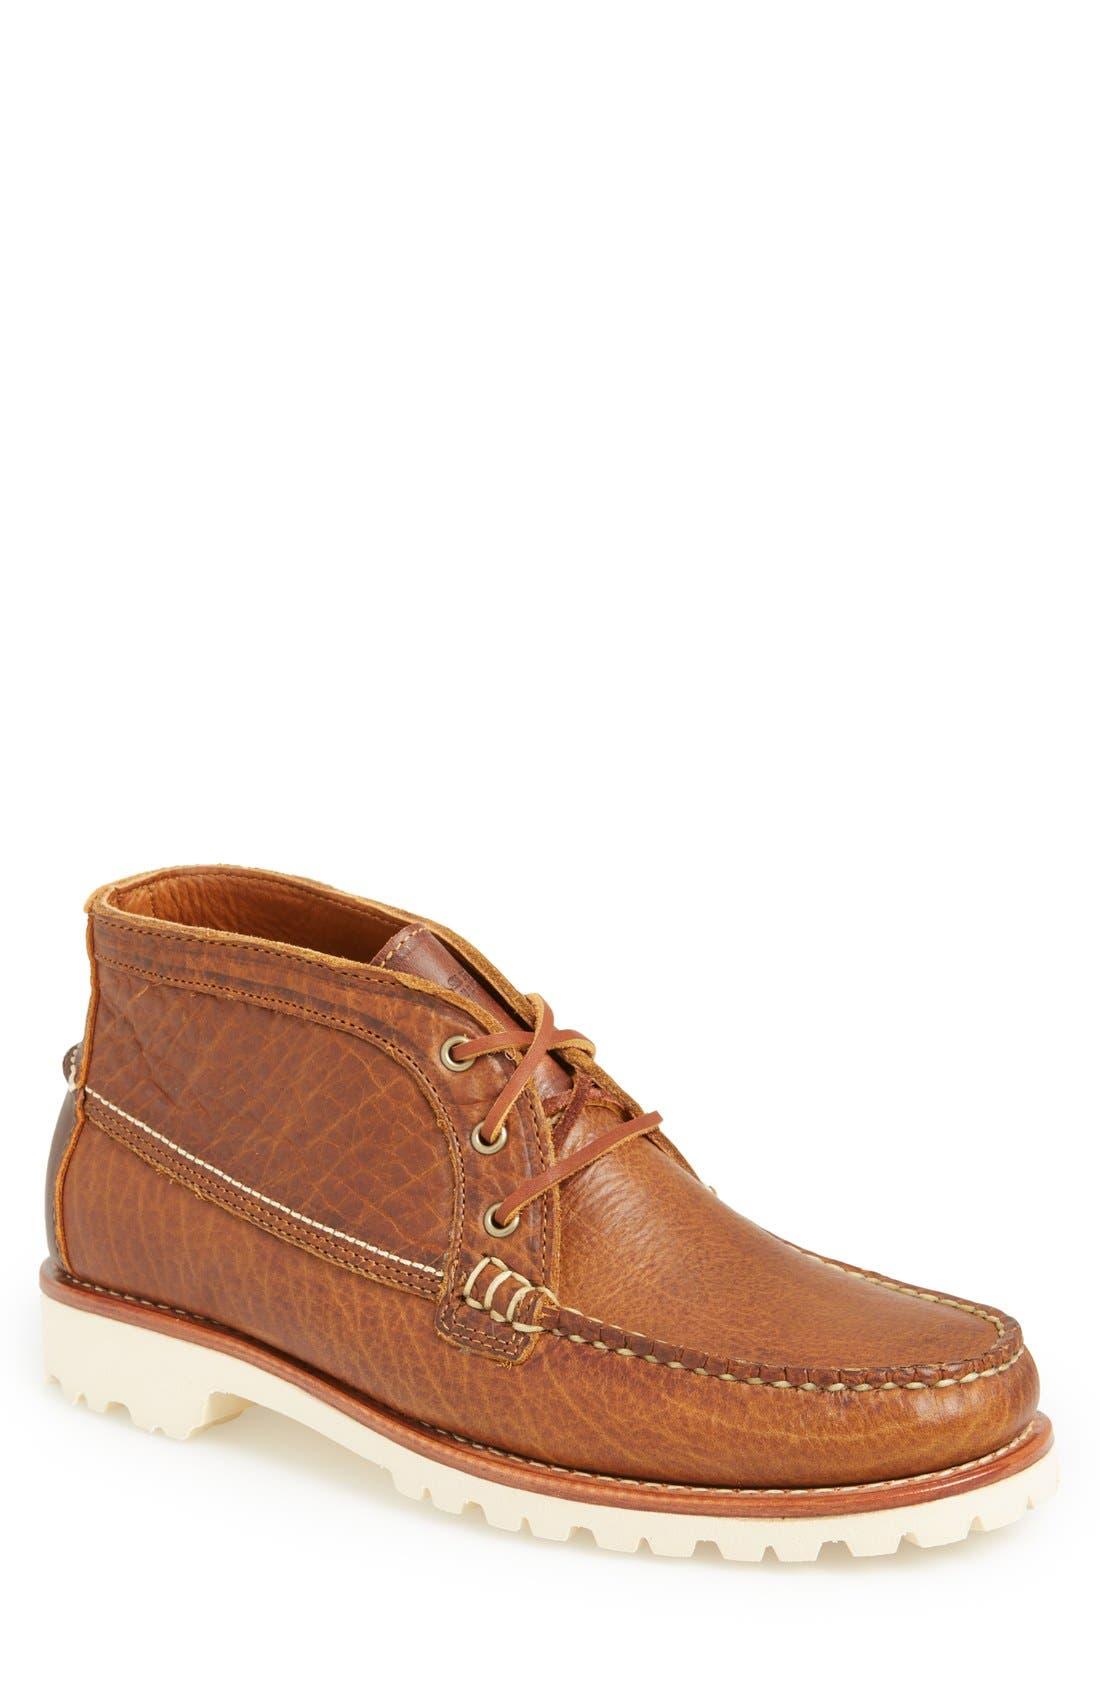 'Charlo' Moc Toe Boot,                         Main,                         color, Whiskey